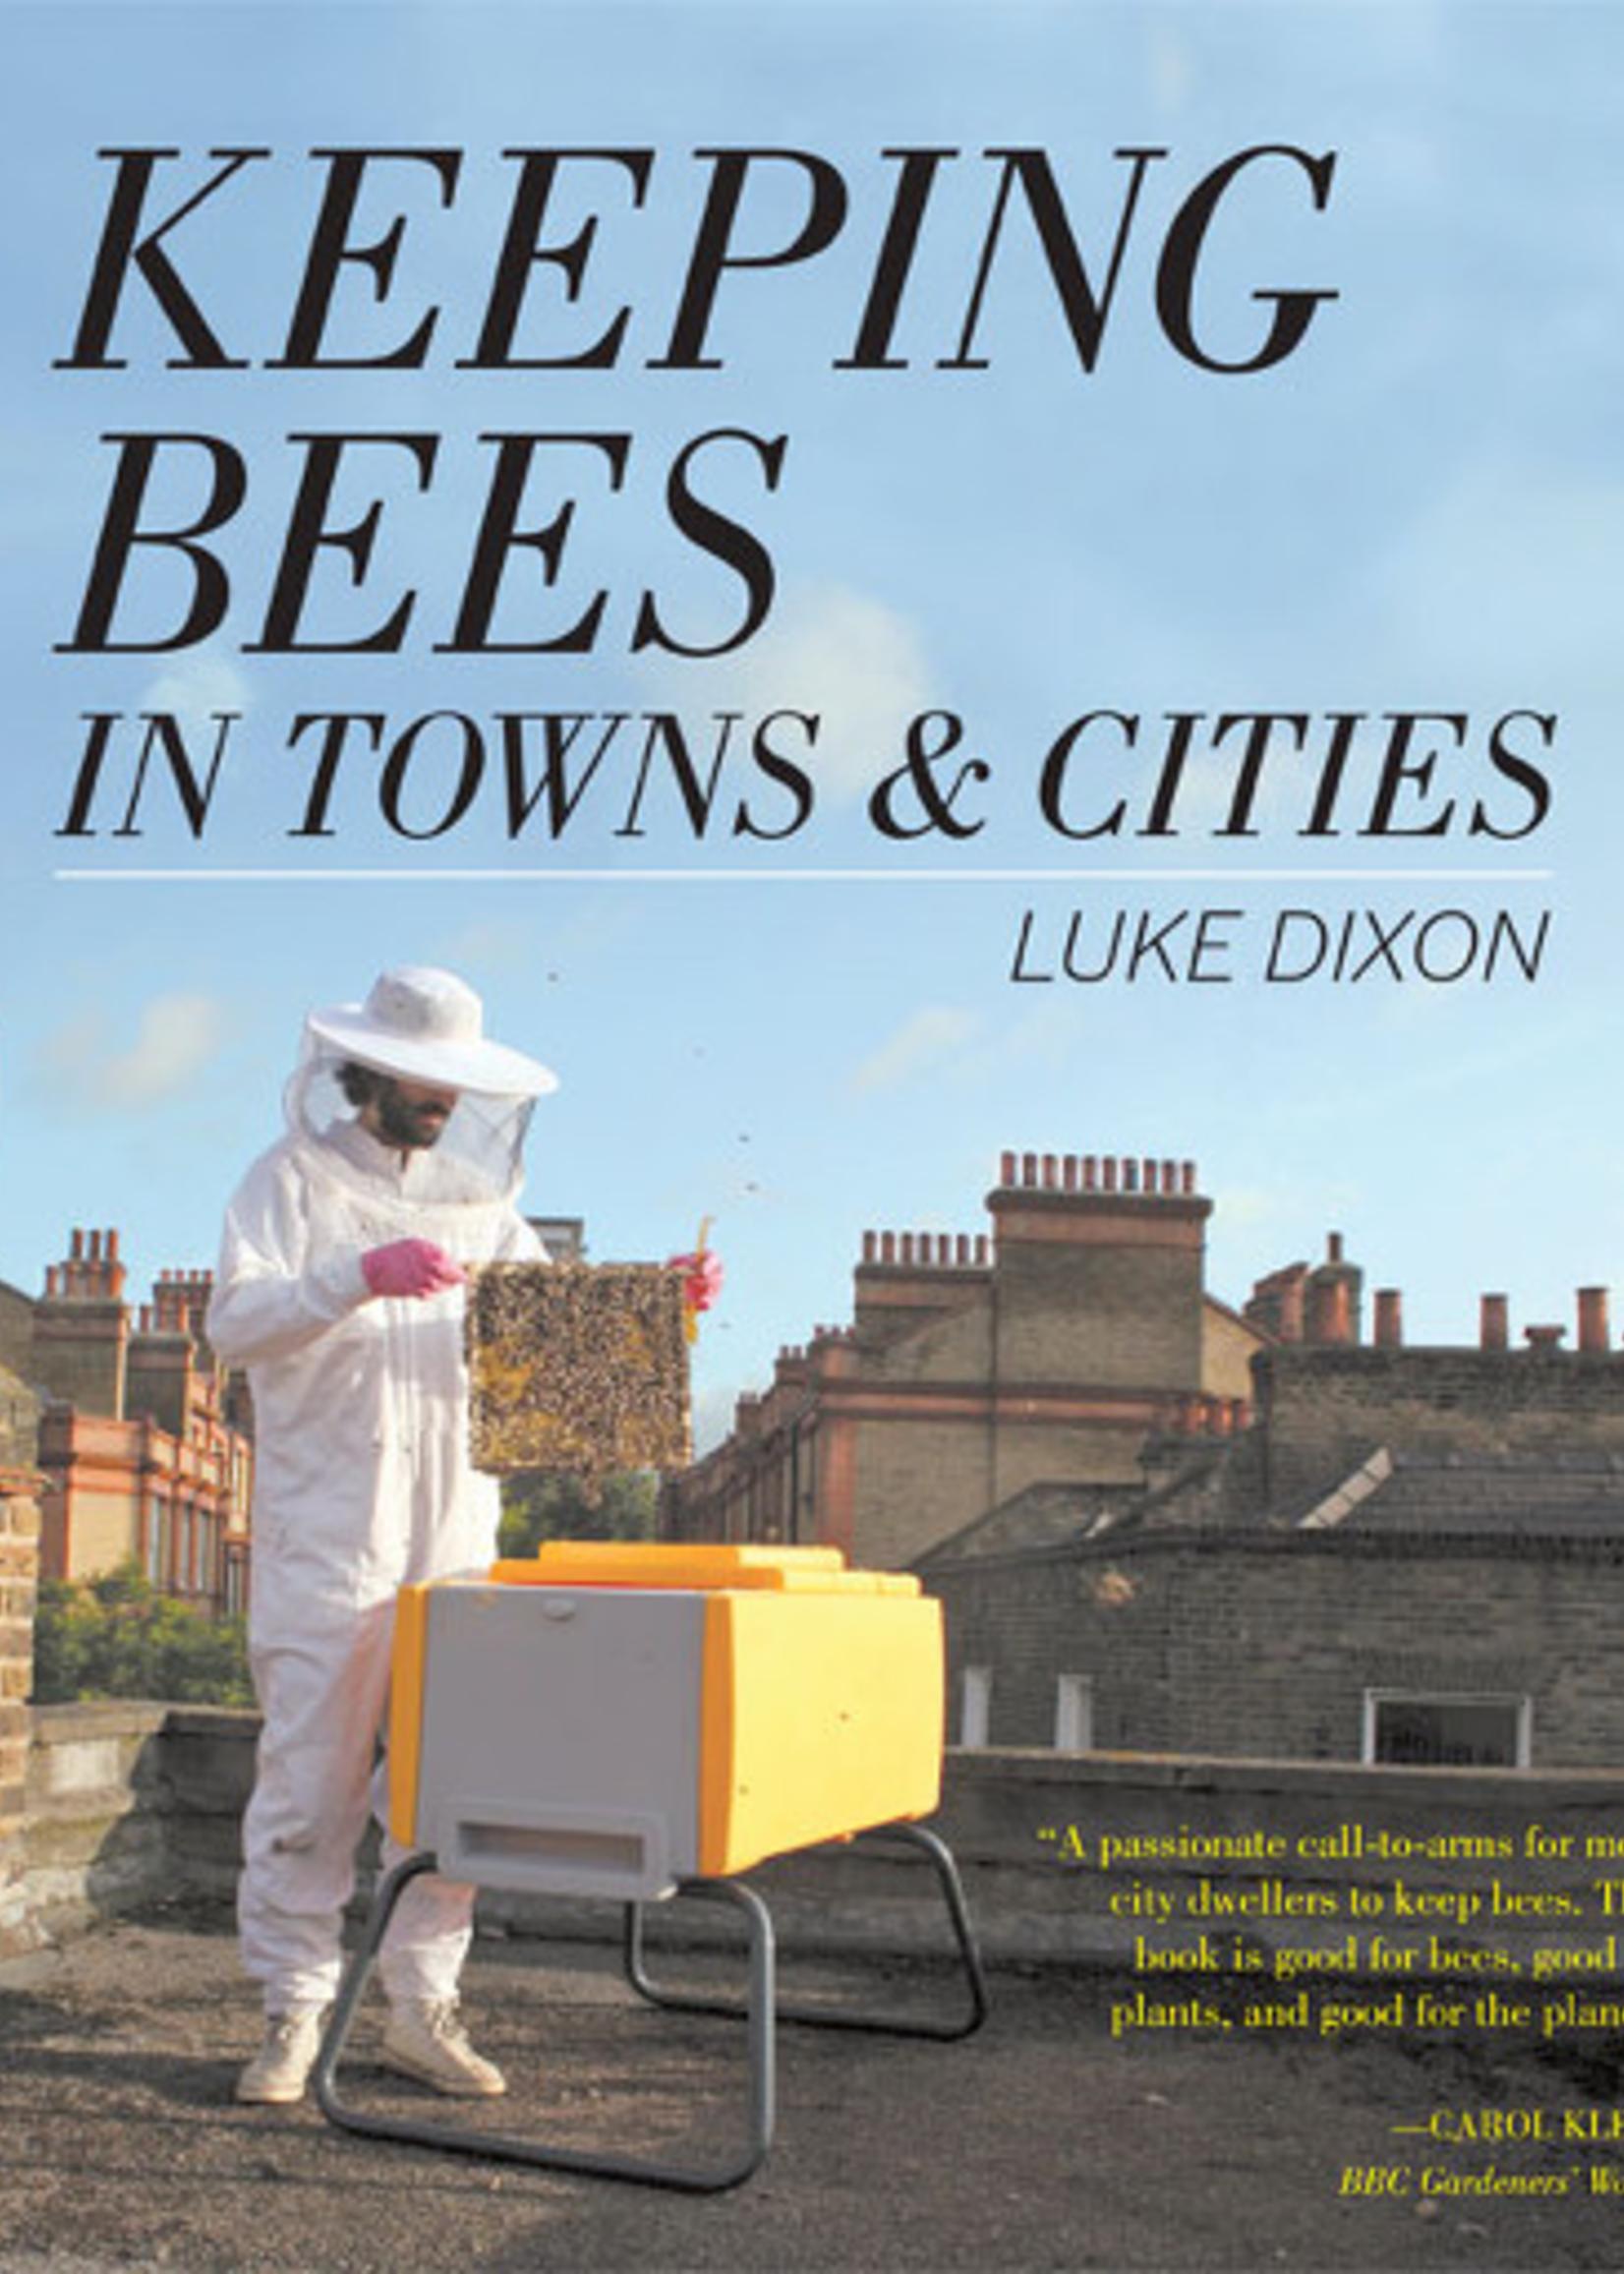 Beginning Beekeeping Keeping Bees in Towns & Cities - Luke Dixon